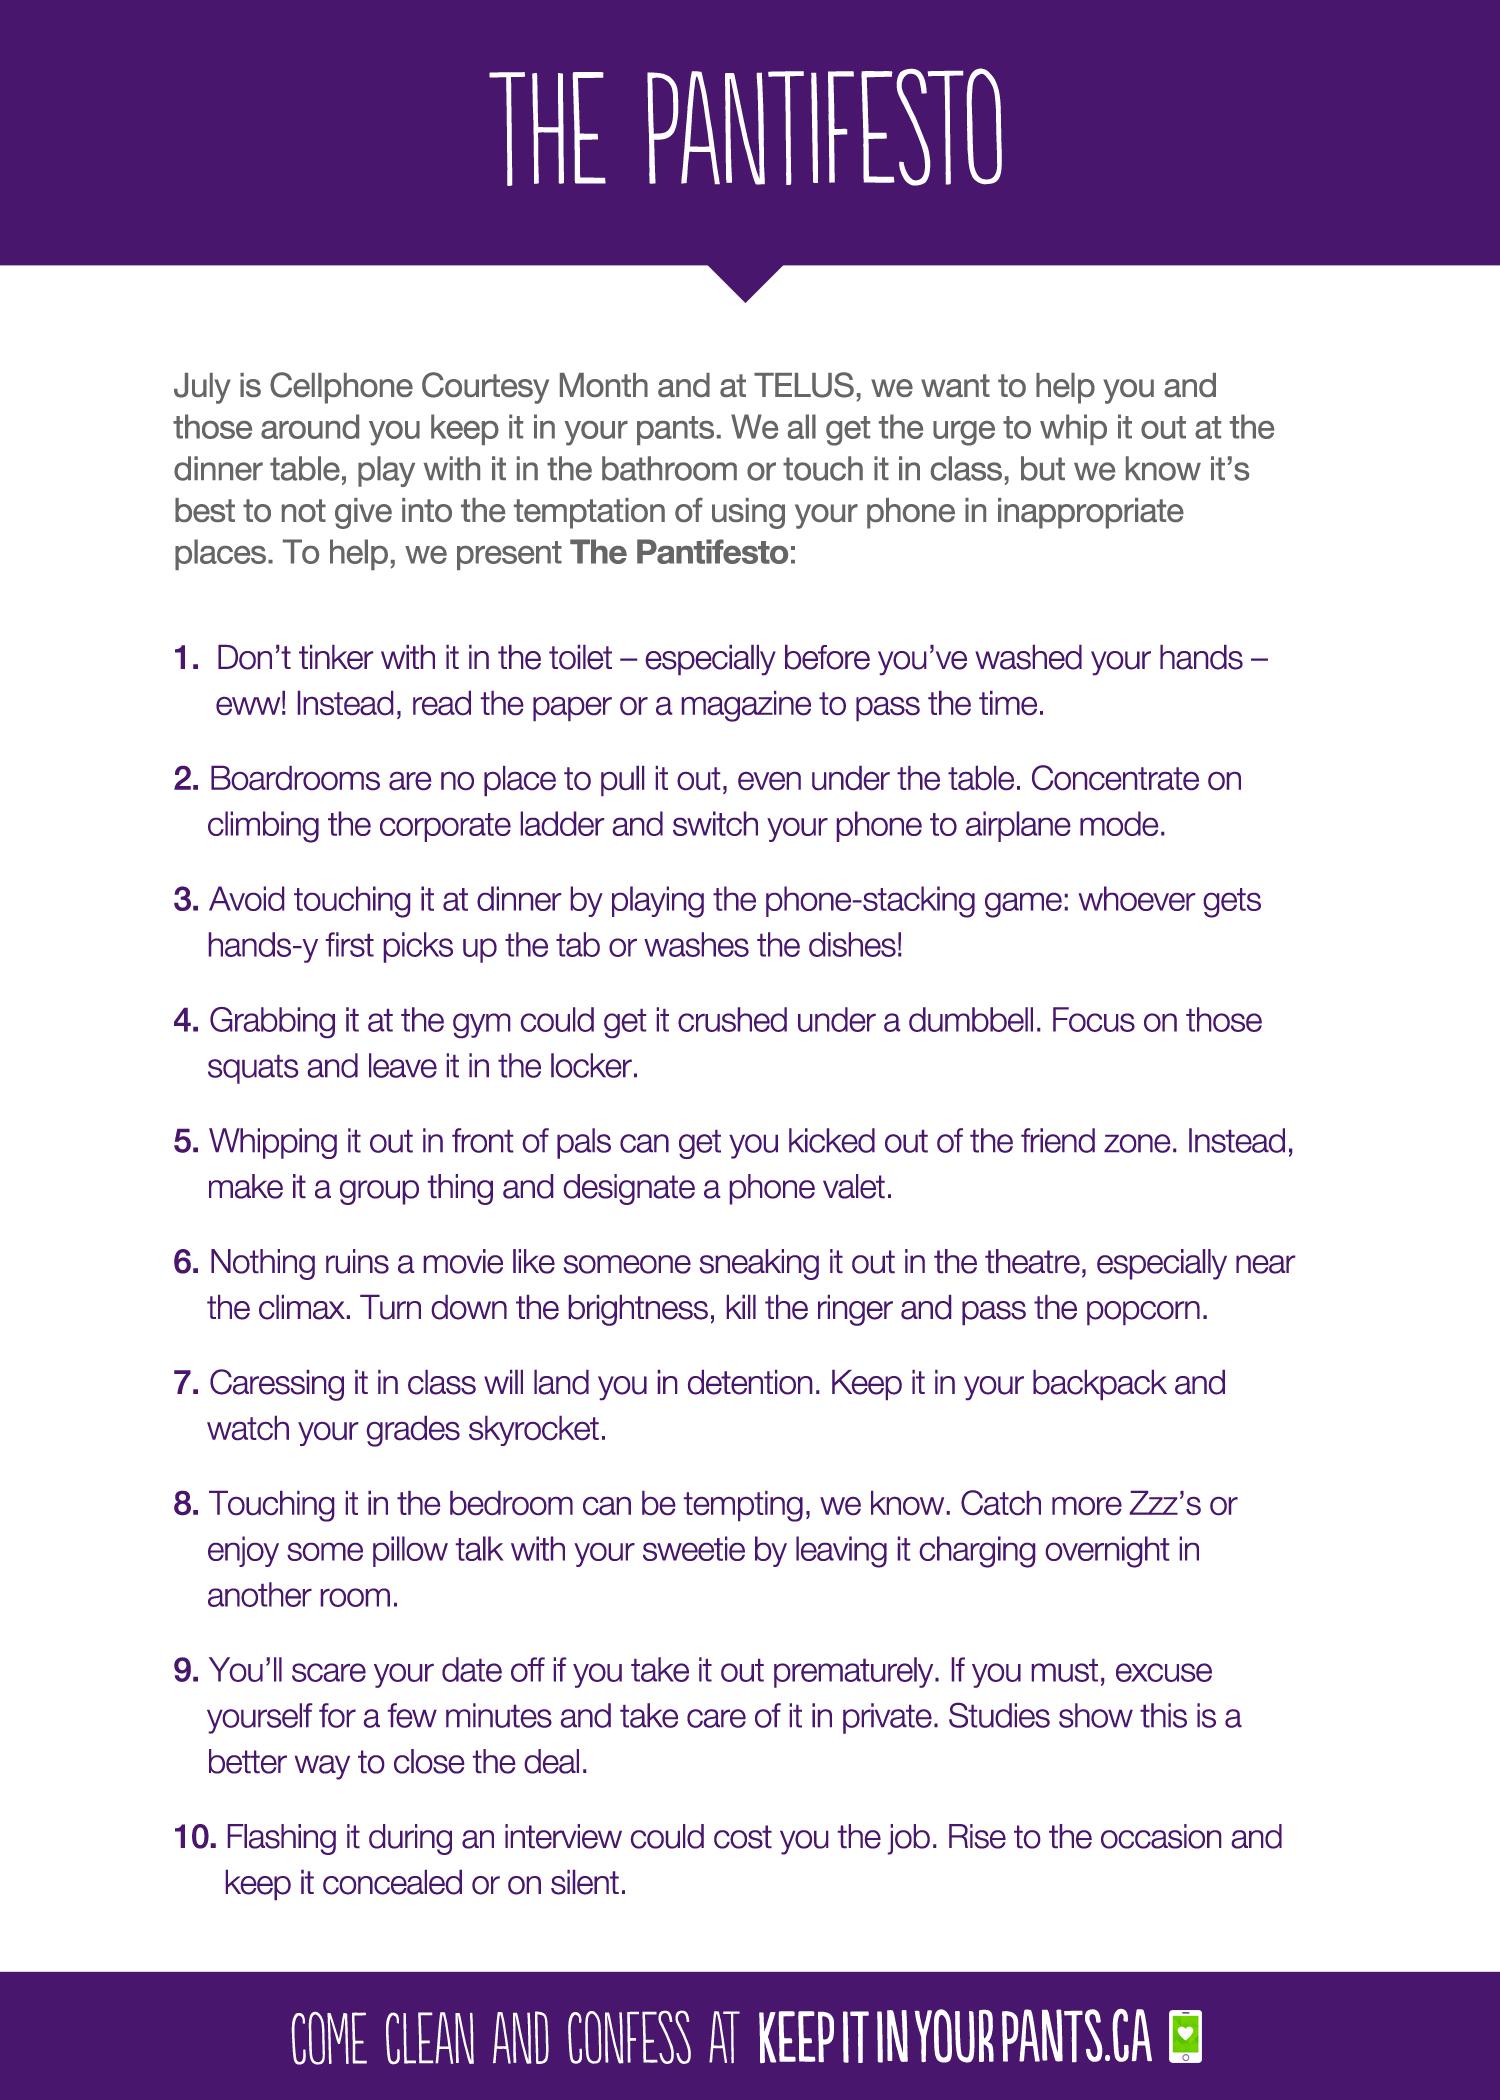 List_10_Things_Back9